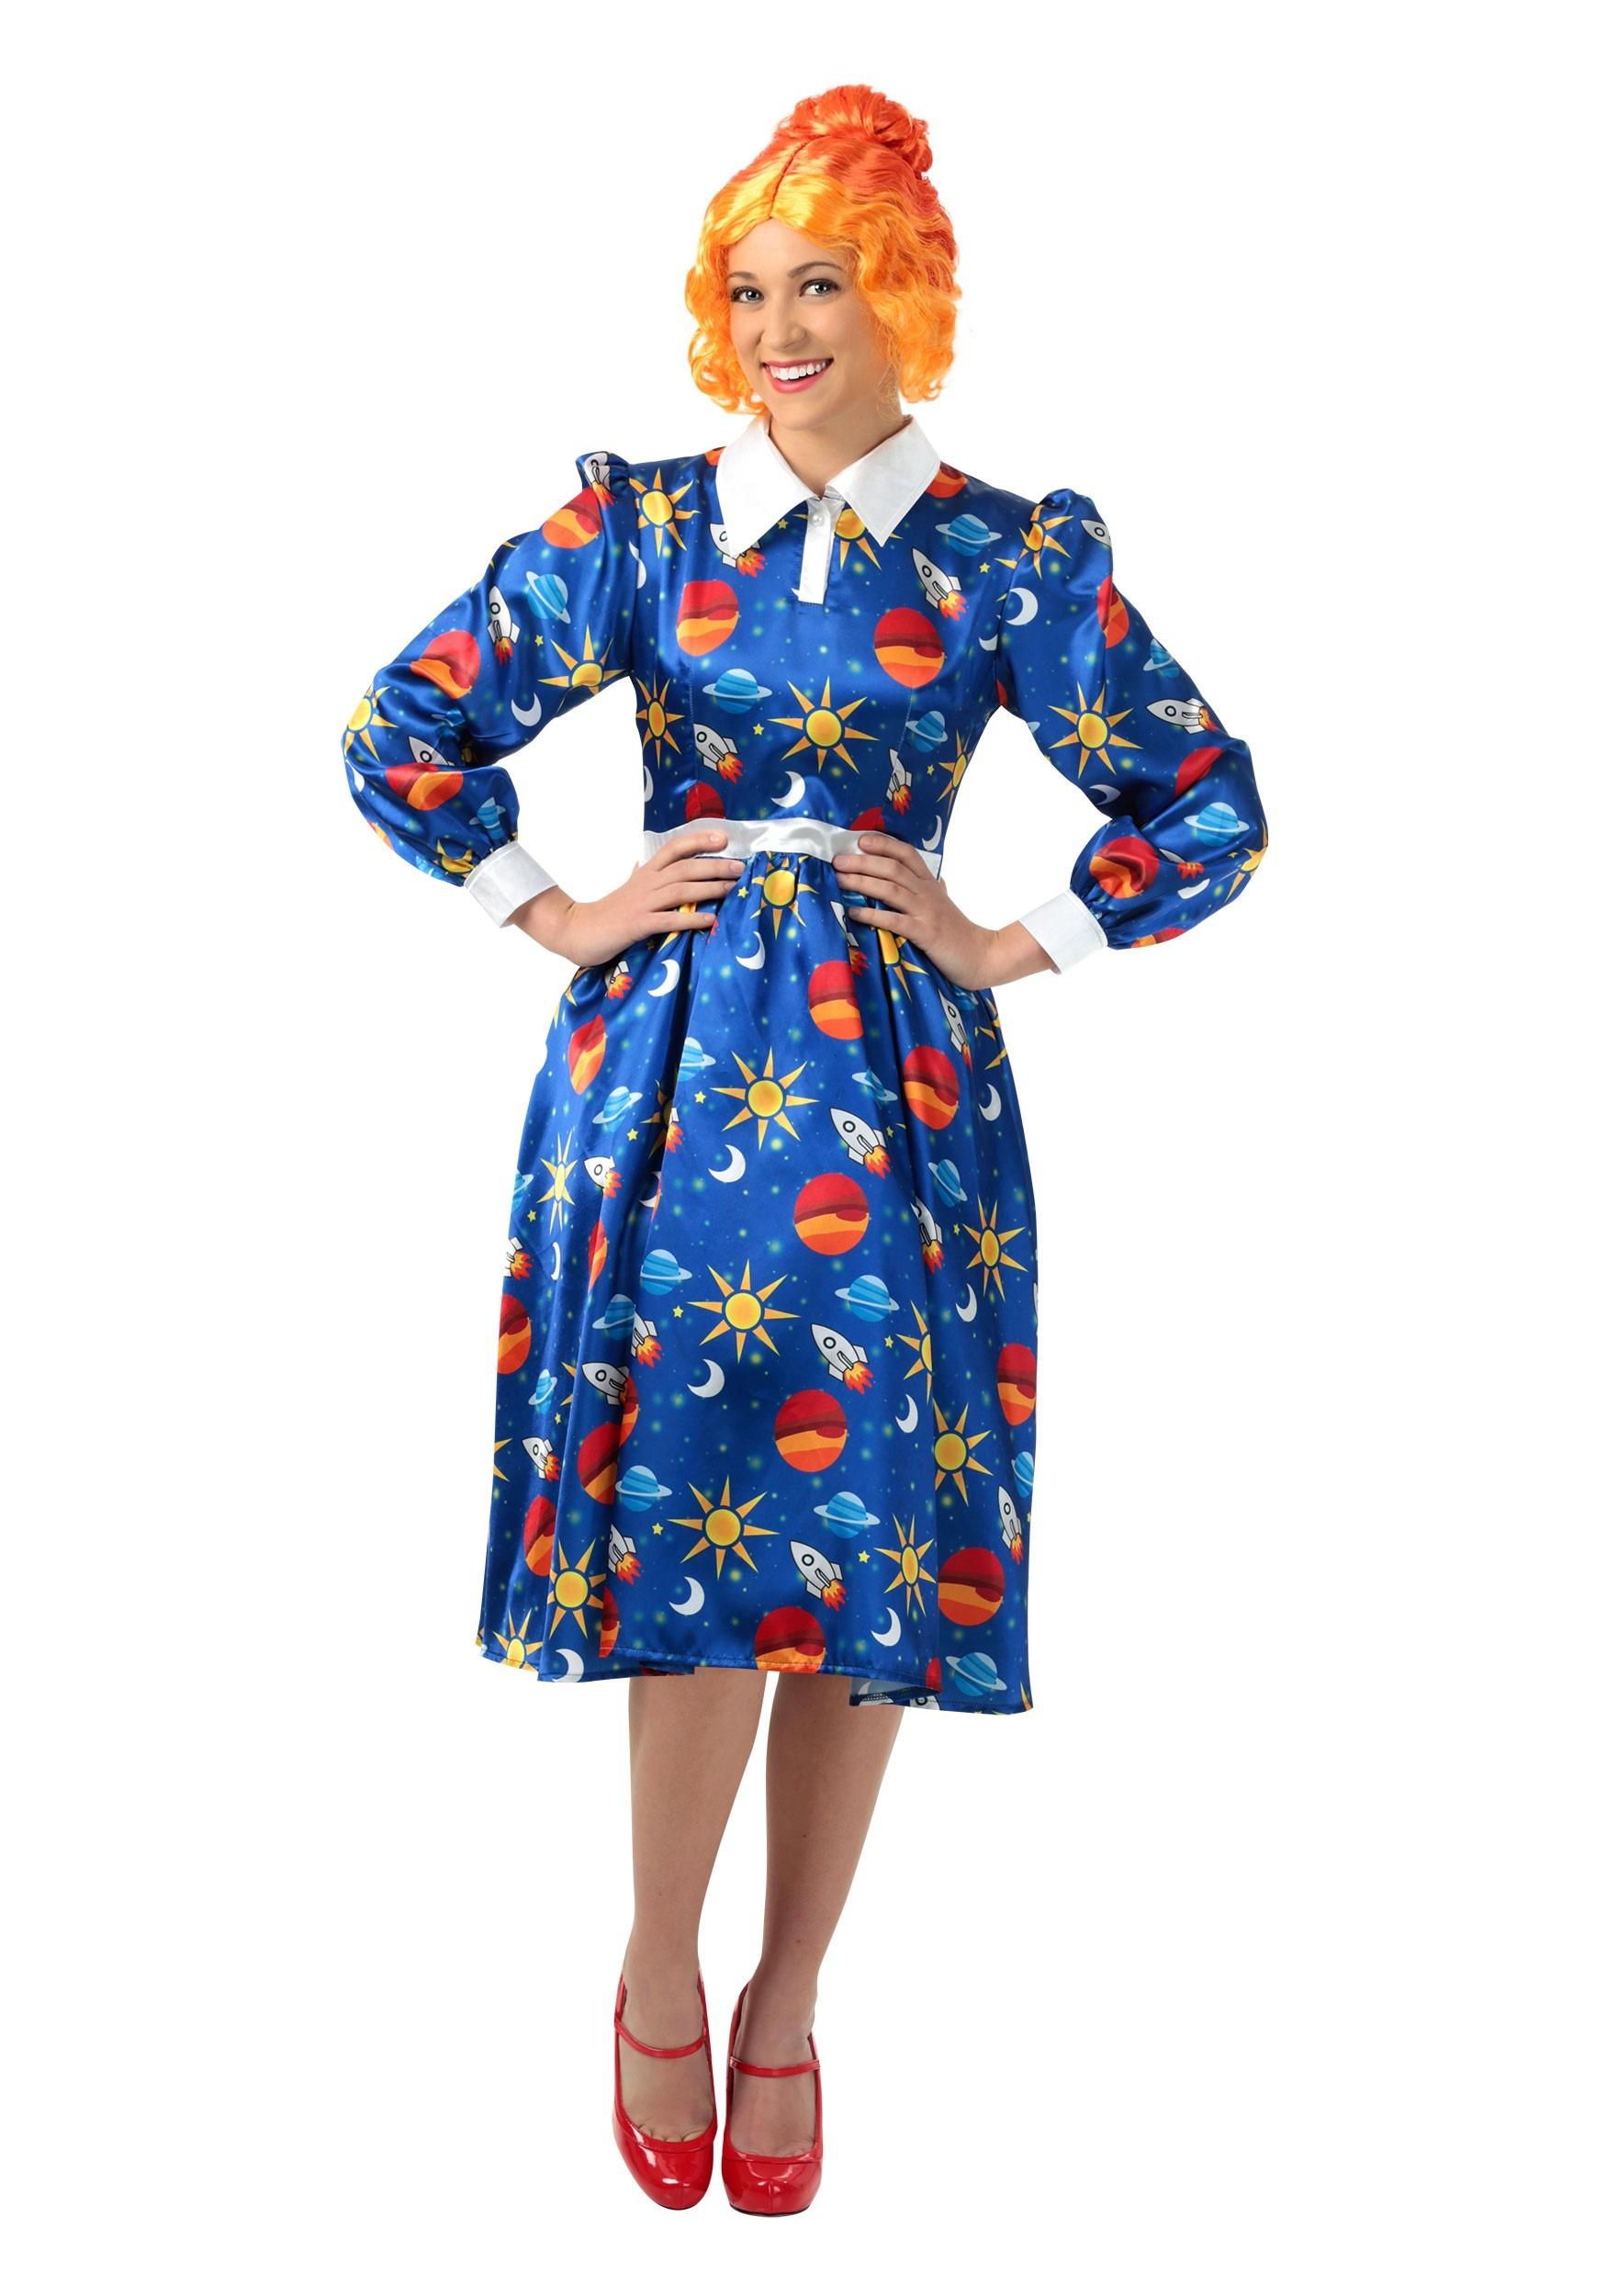 The Magic School Bus Miss Frizzle Costume